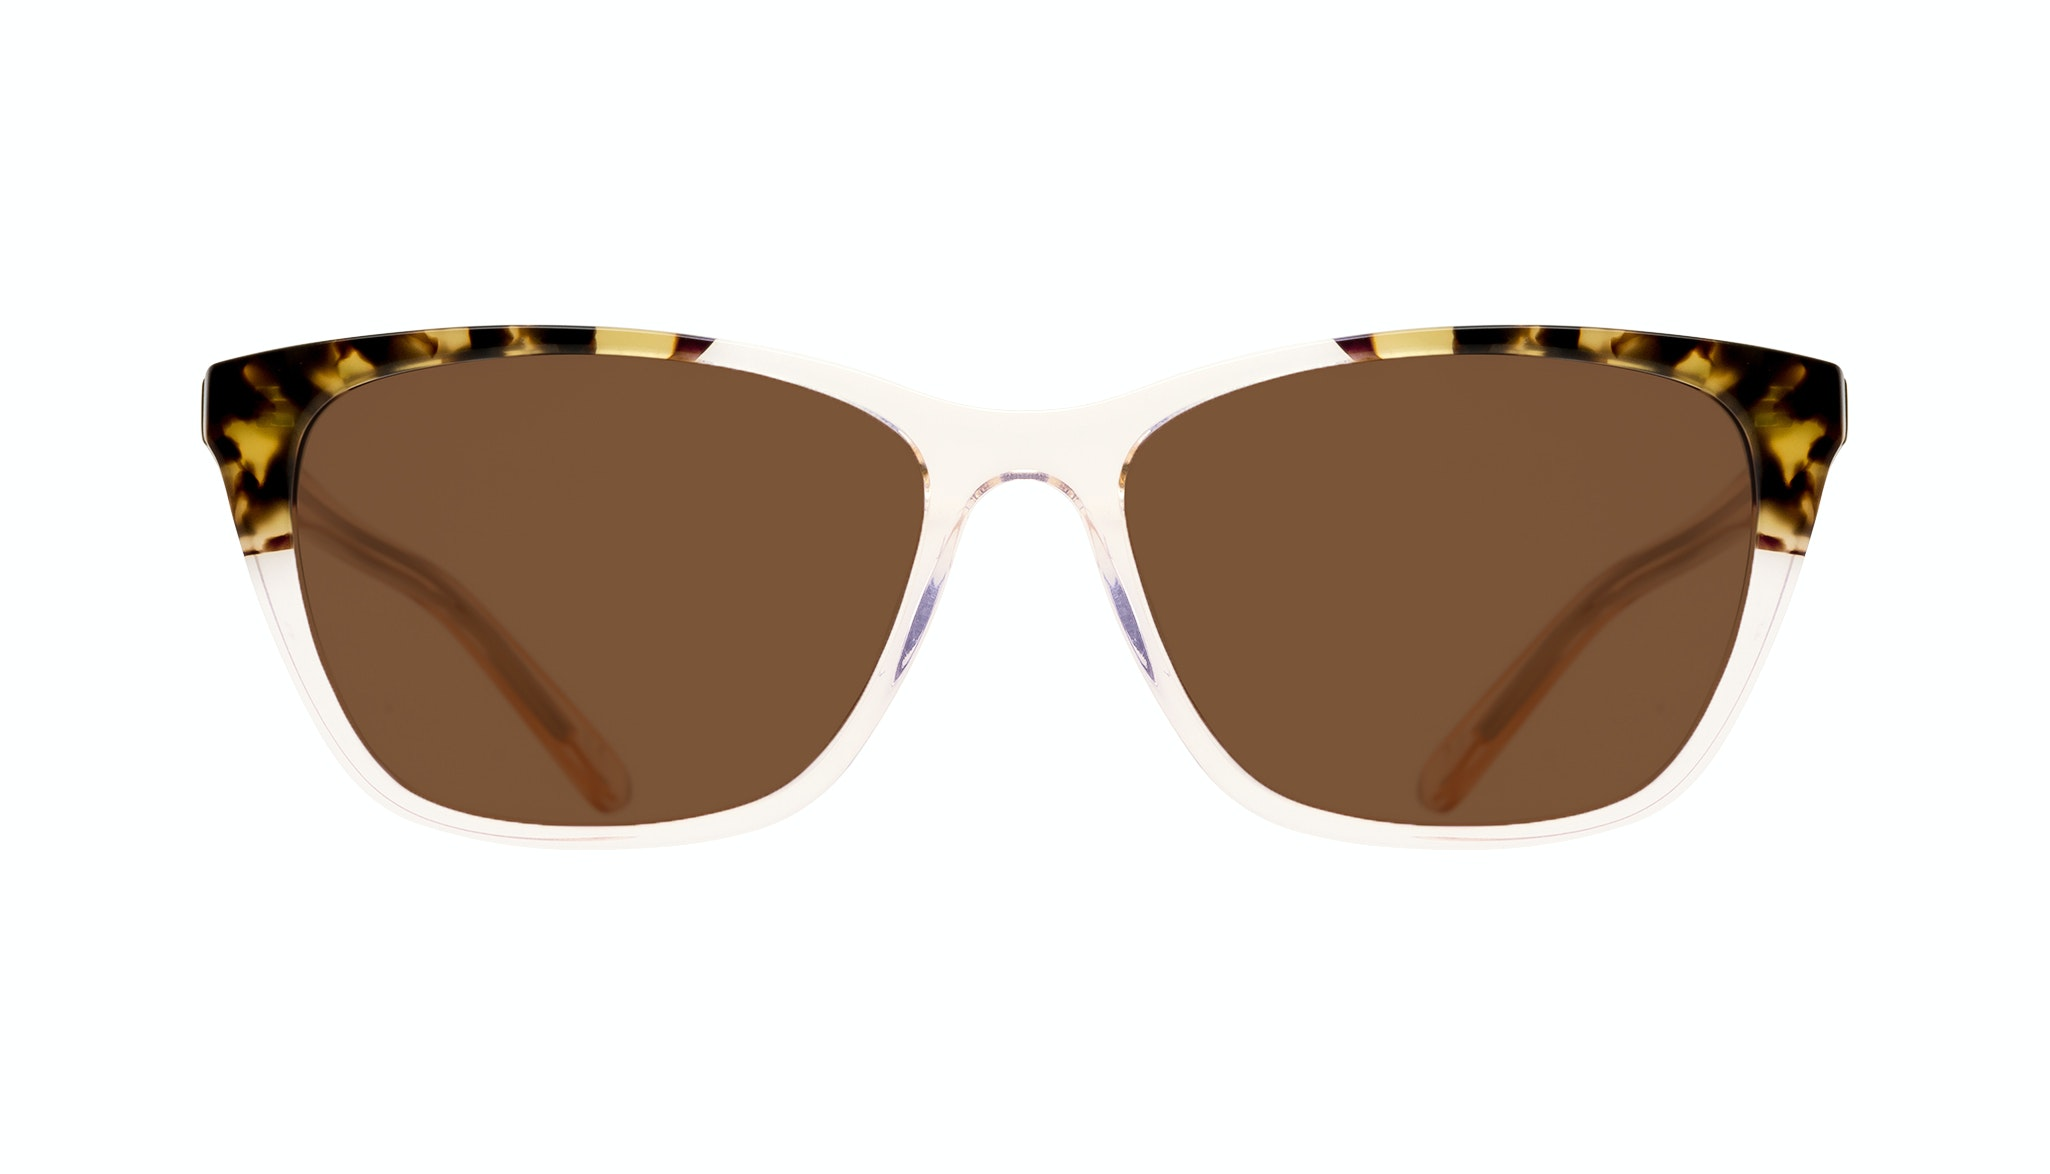 Affordable Fashion Glasses Cat Eye Rectangle Sunglasses Women Myrtle Blond Tortoise